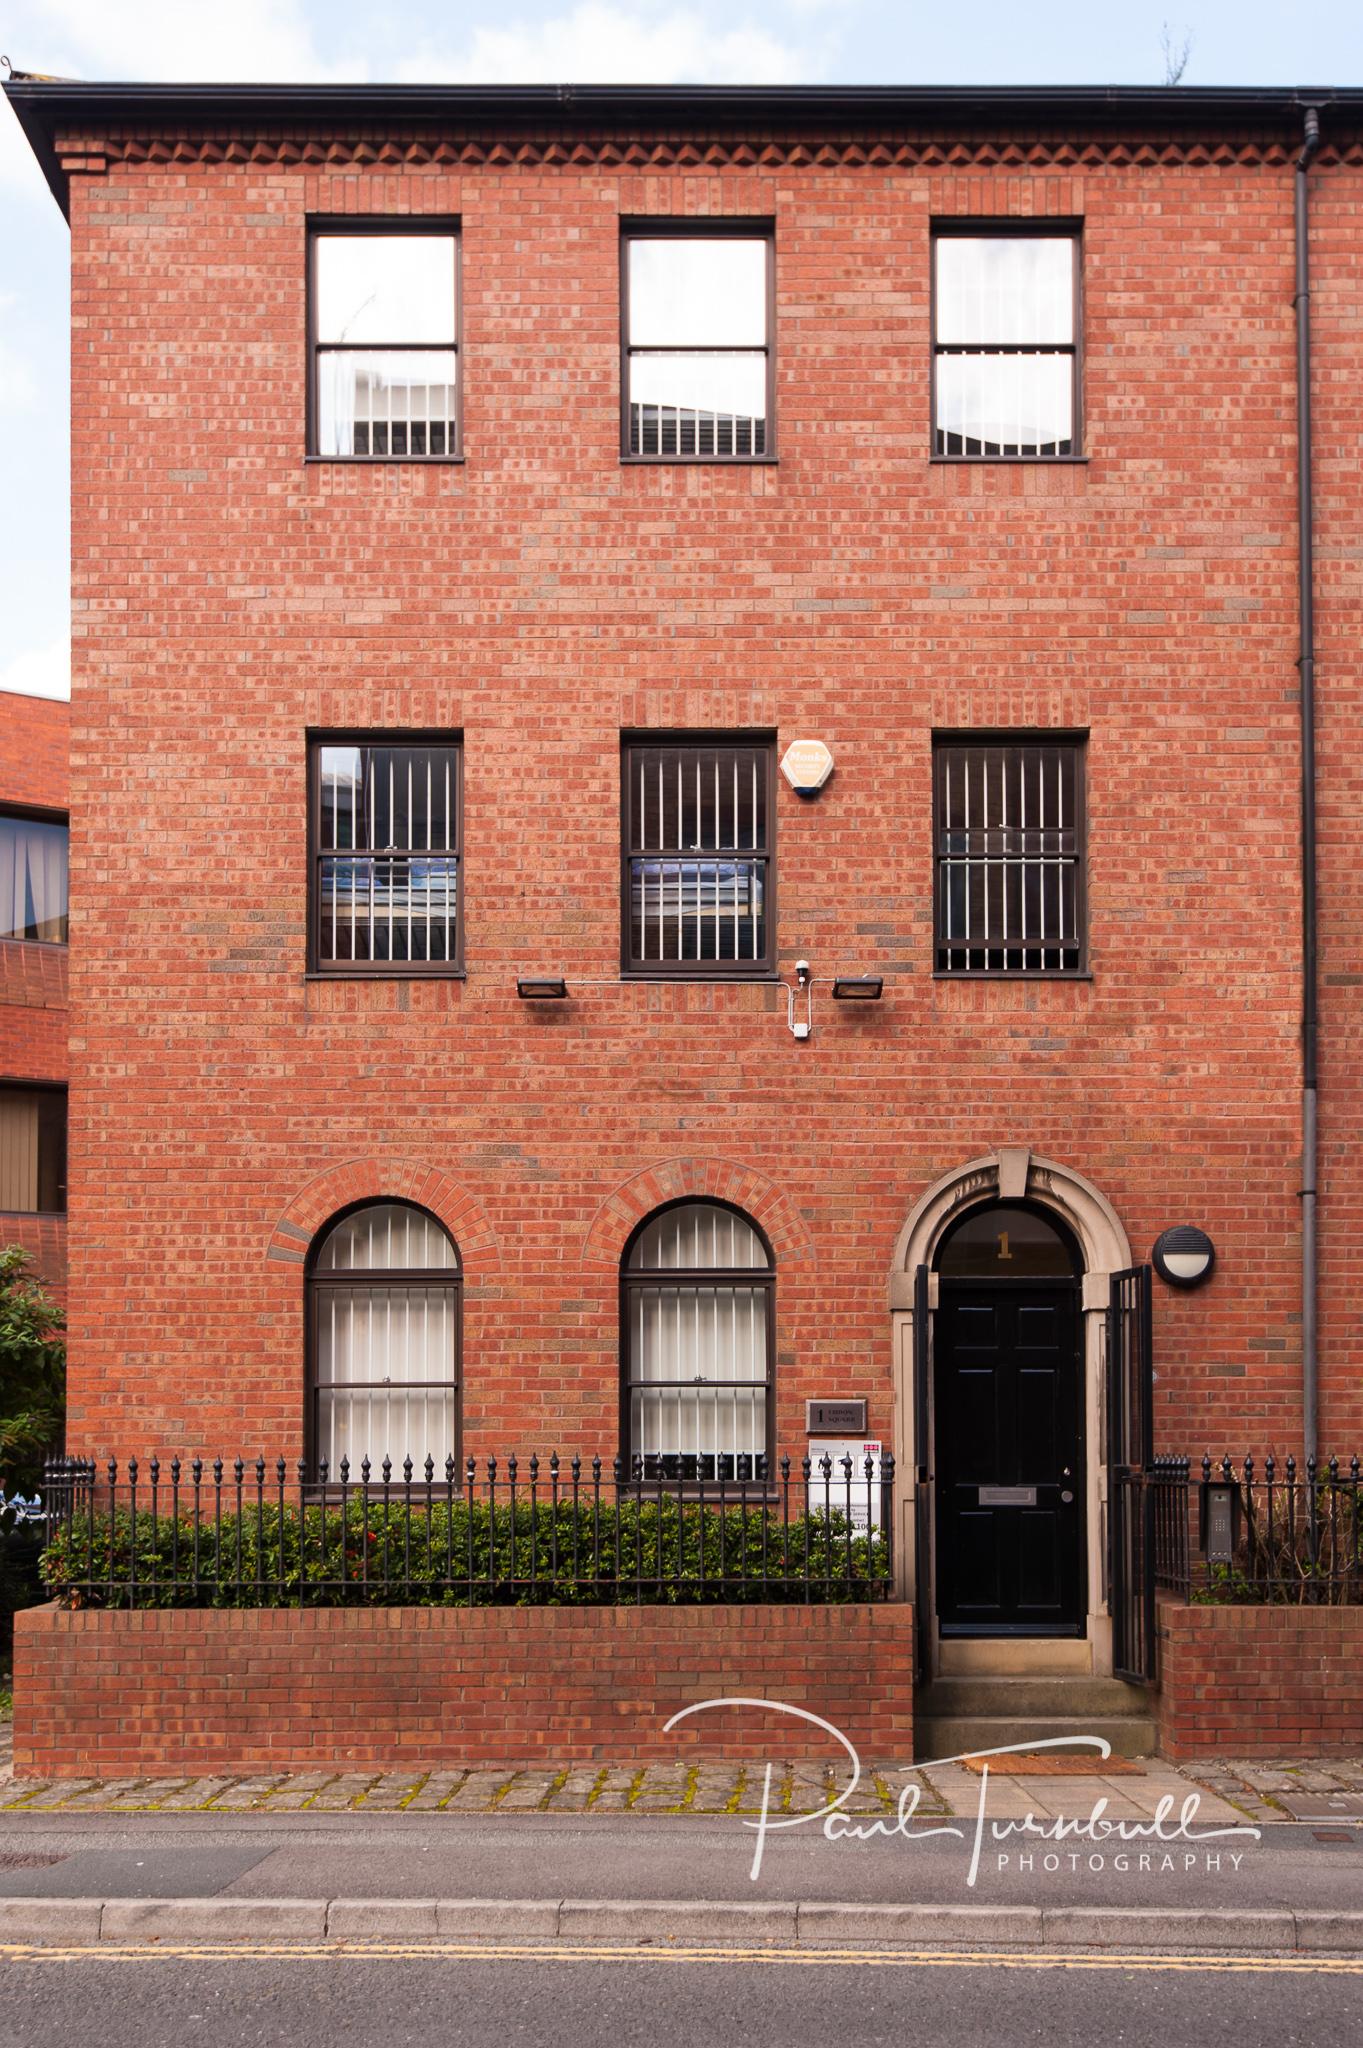 commercial-property-photographer-leeds-yorkshire-rs-hostels-001.jpg